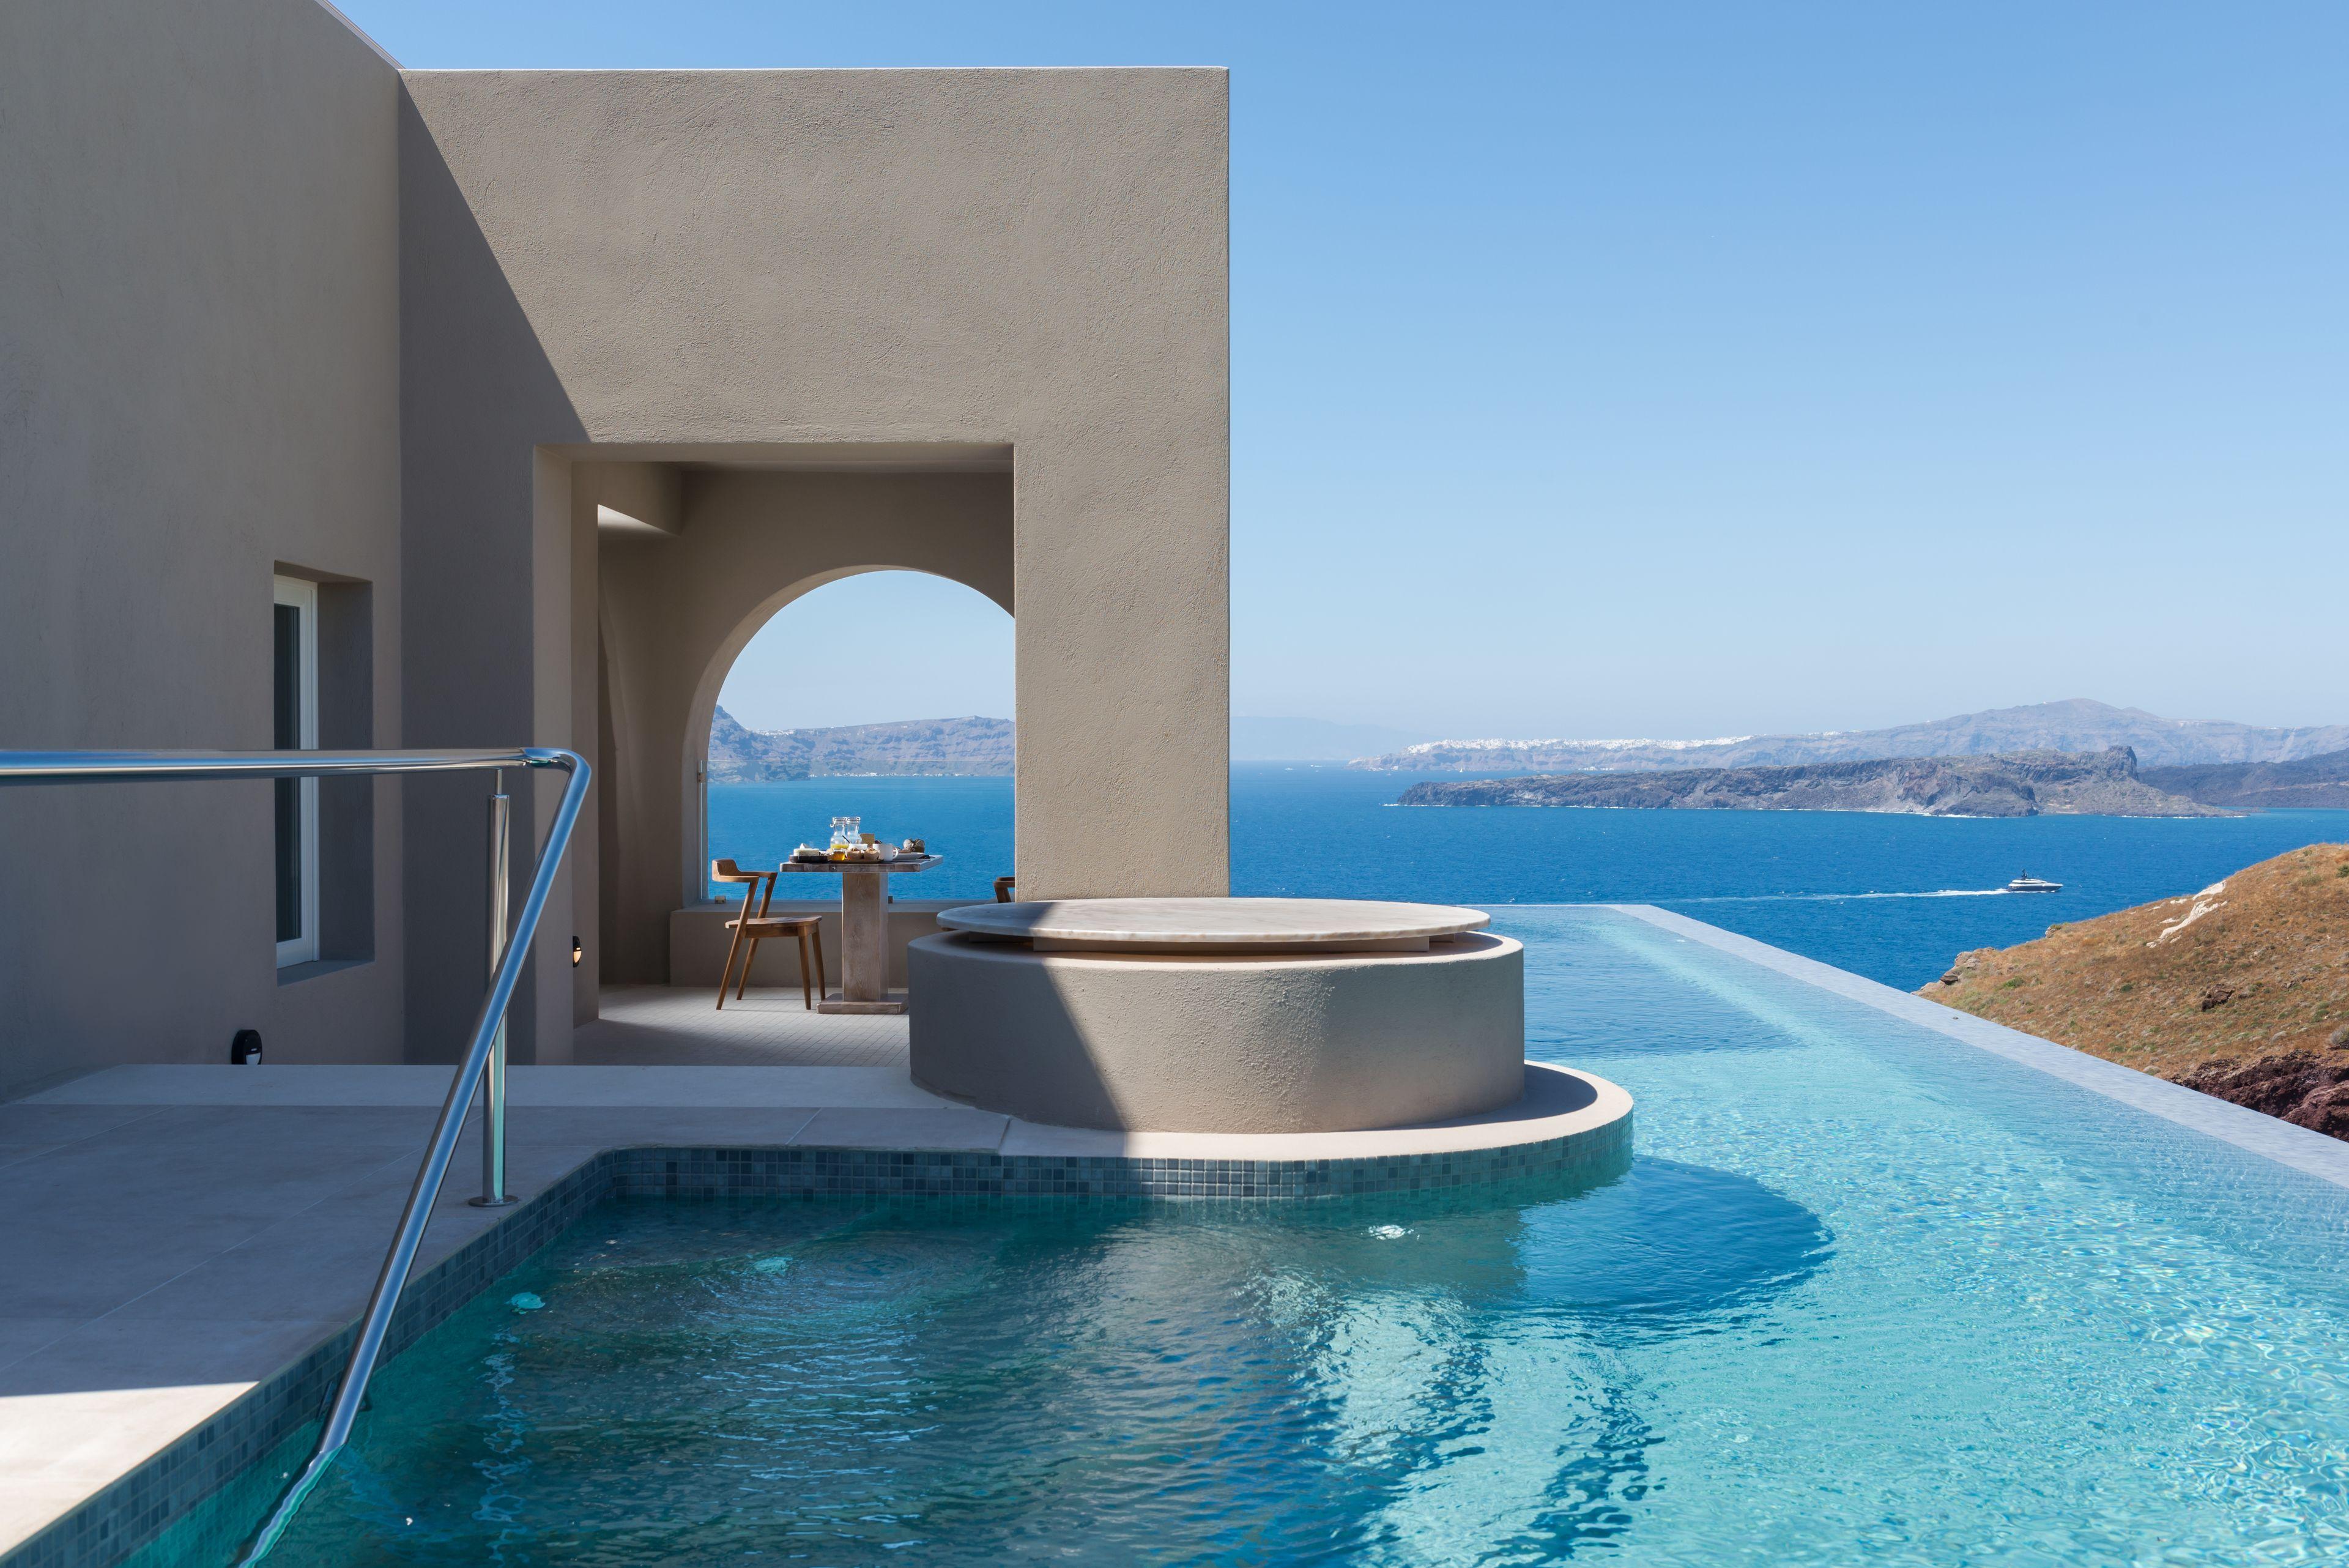 Arota Exclusive Villas